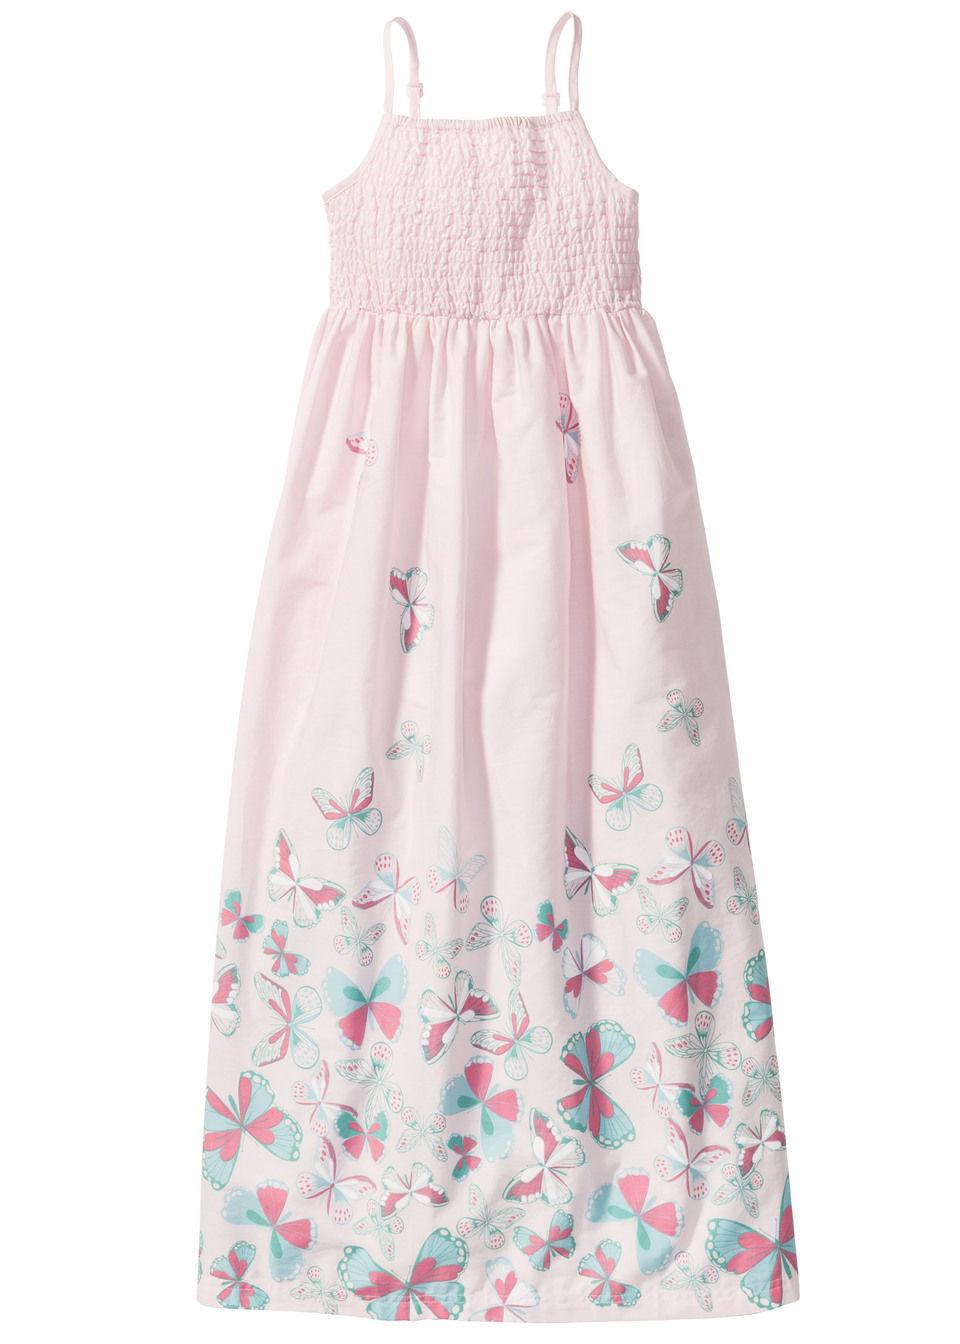 Фото - Макси-платье на бретелях-спагетти от bonprix нежно-розового цвета